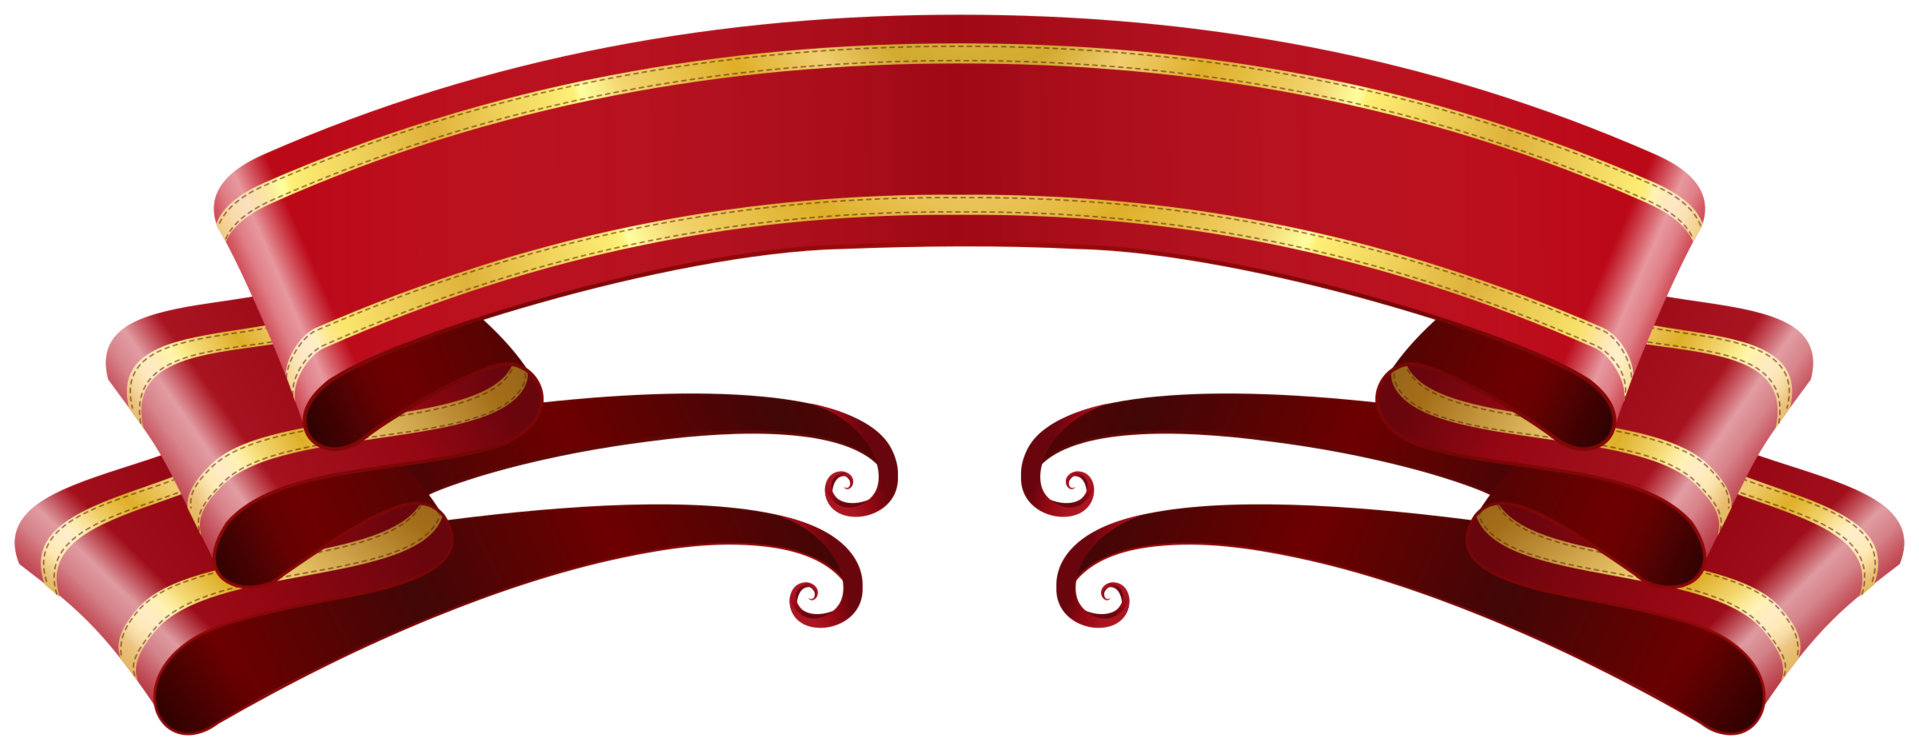 Logo,Line,Red